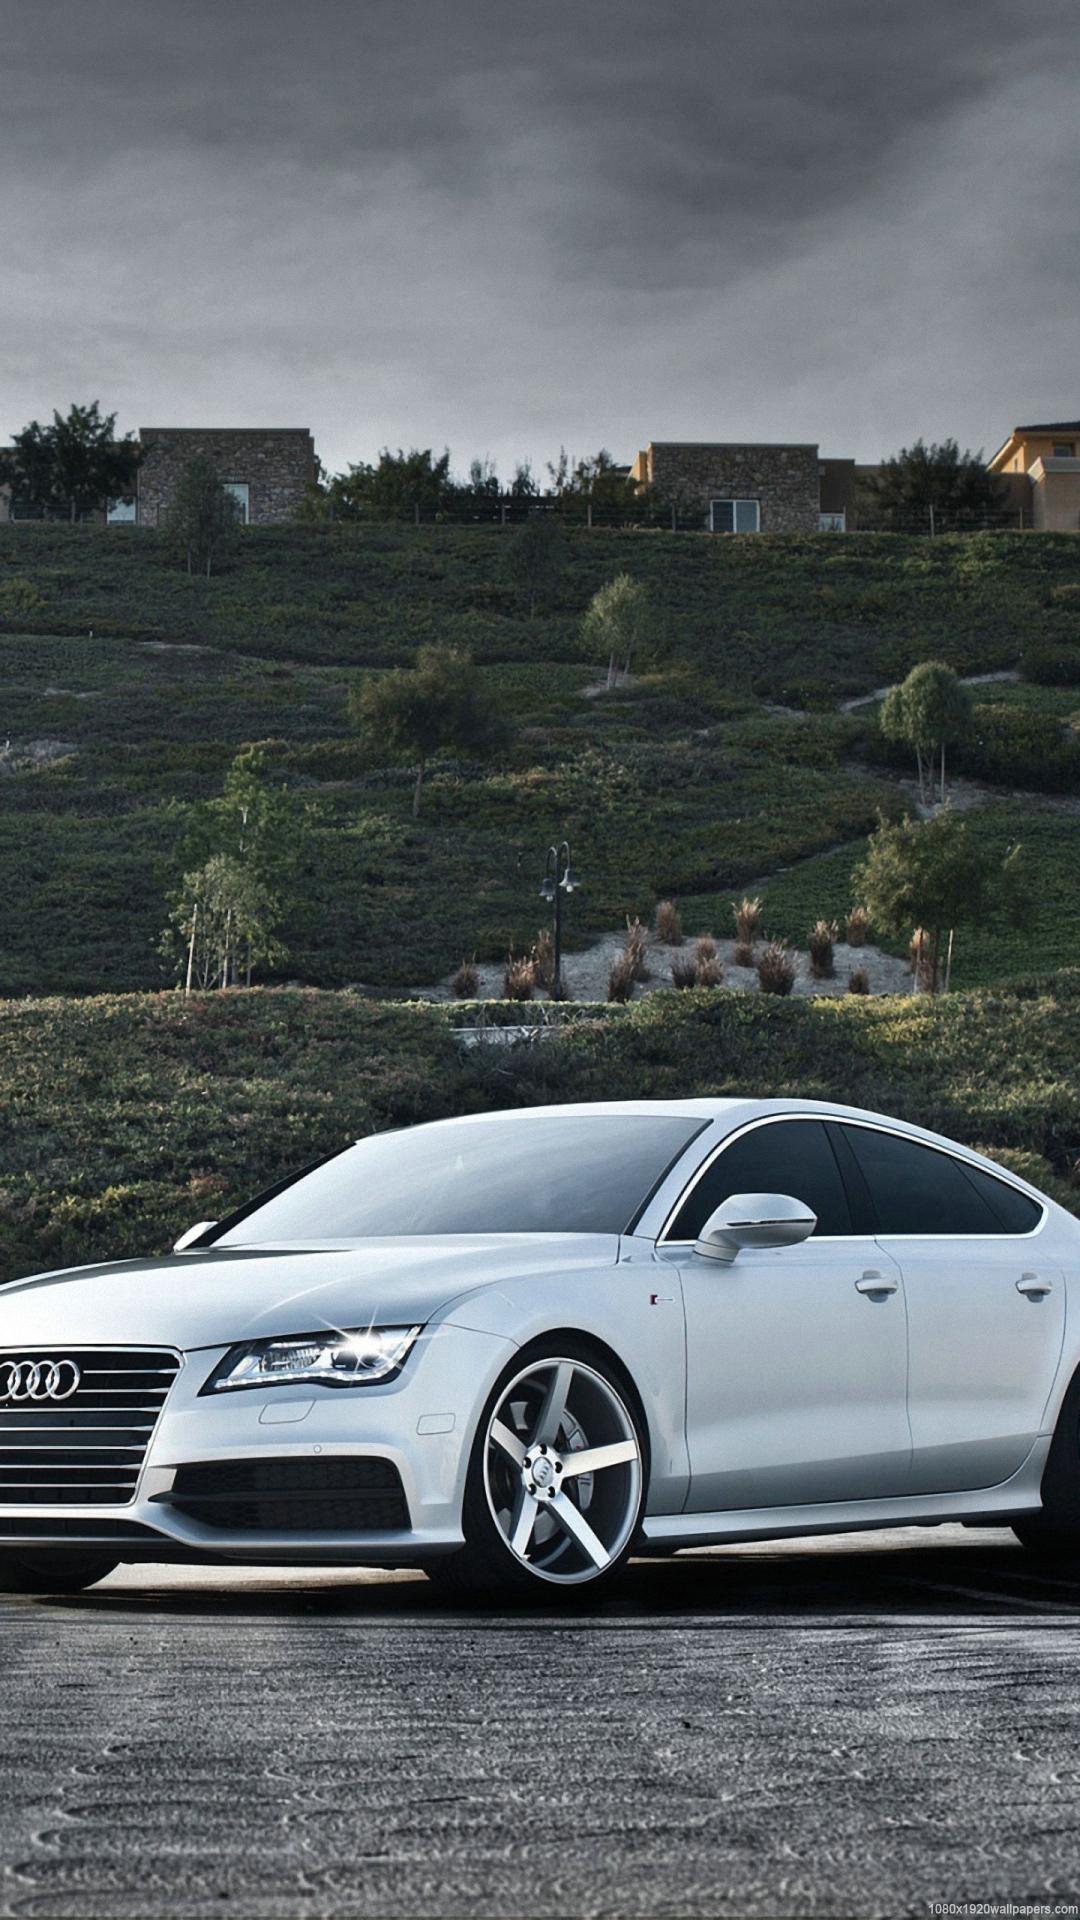 Audi Car Wallpaper Hd Android 1080x1920 Download Hd Wallpaper Wallpapertip